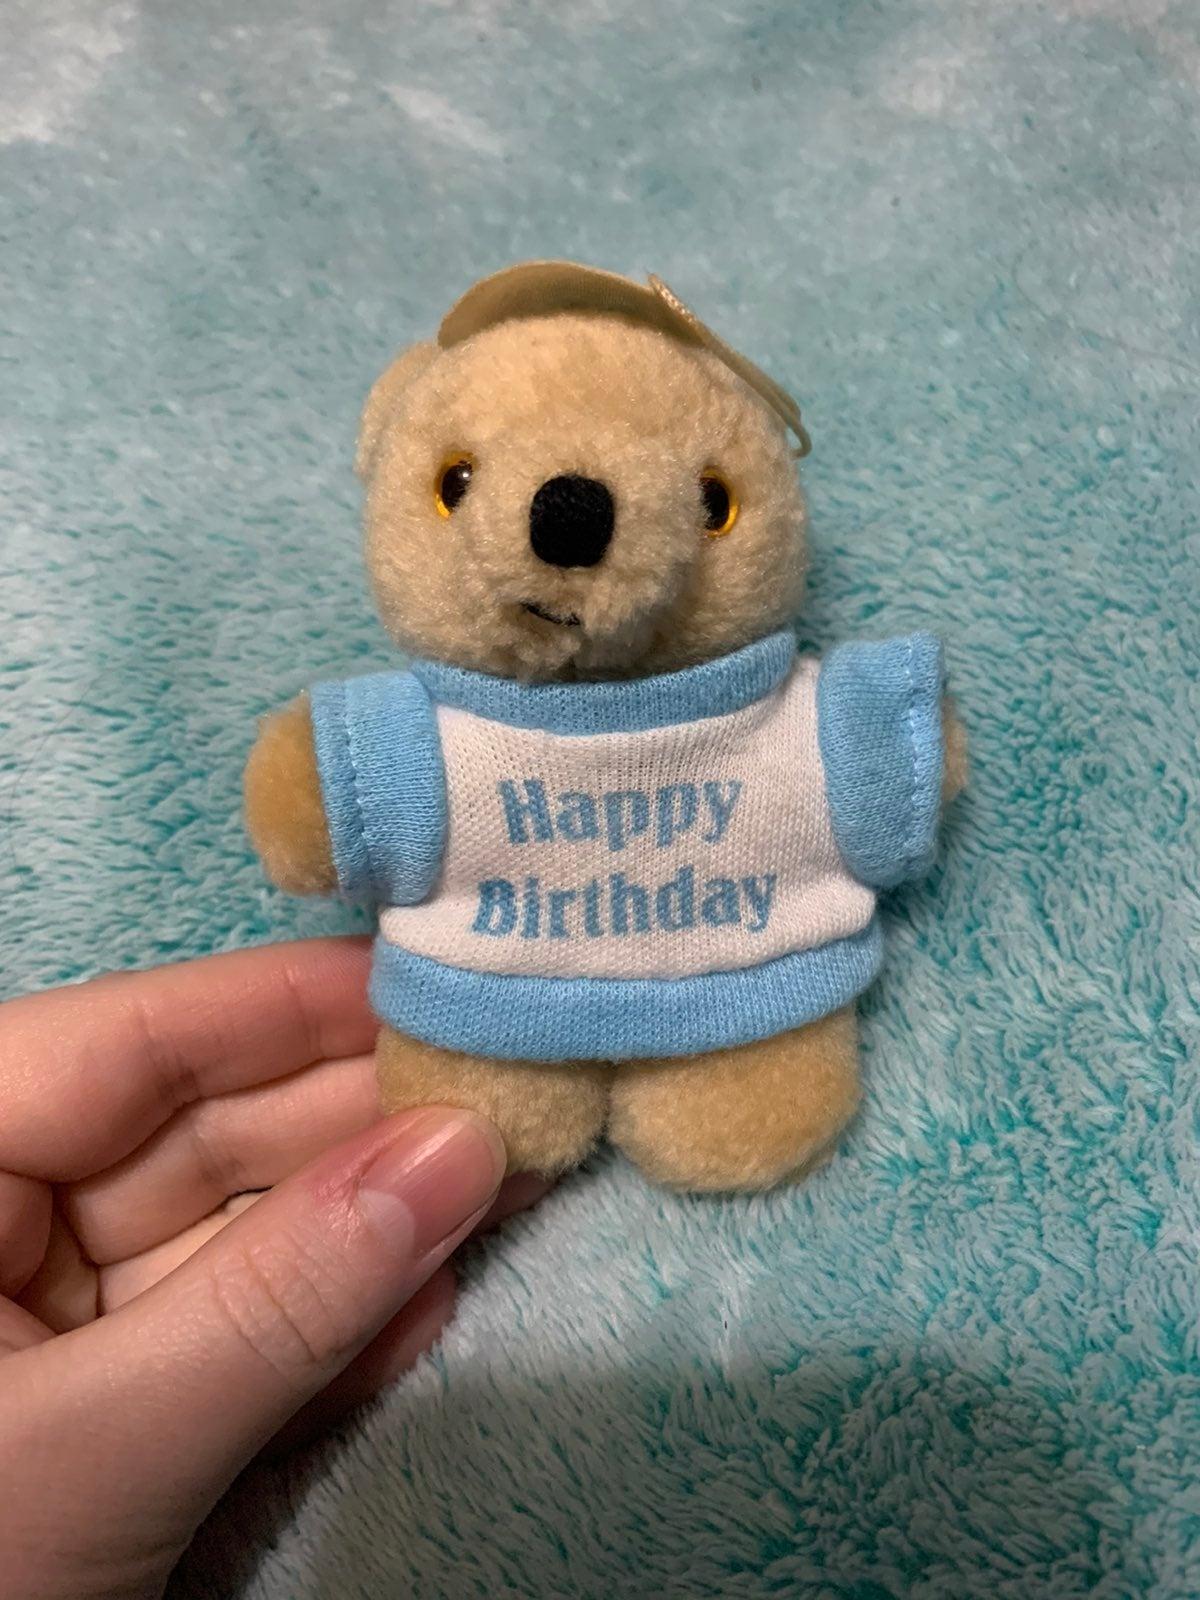 Happy Birthday Bear Plush